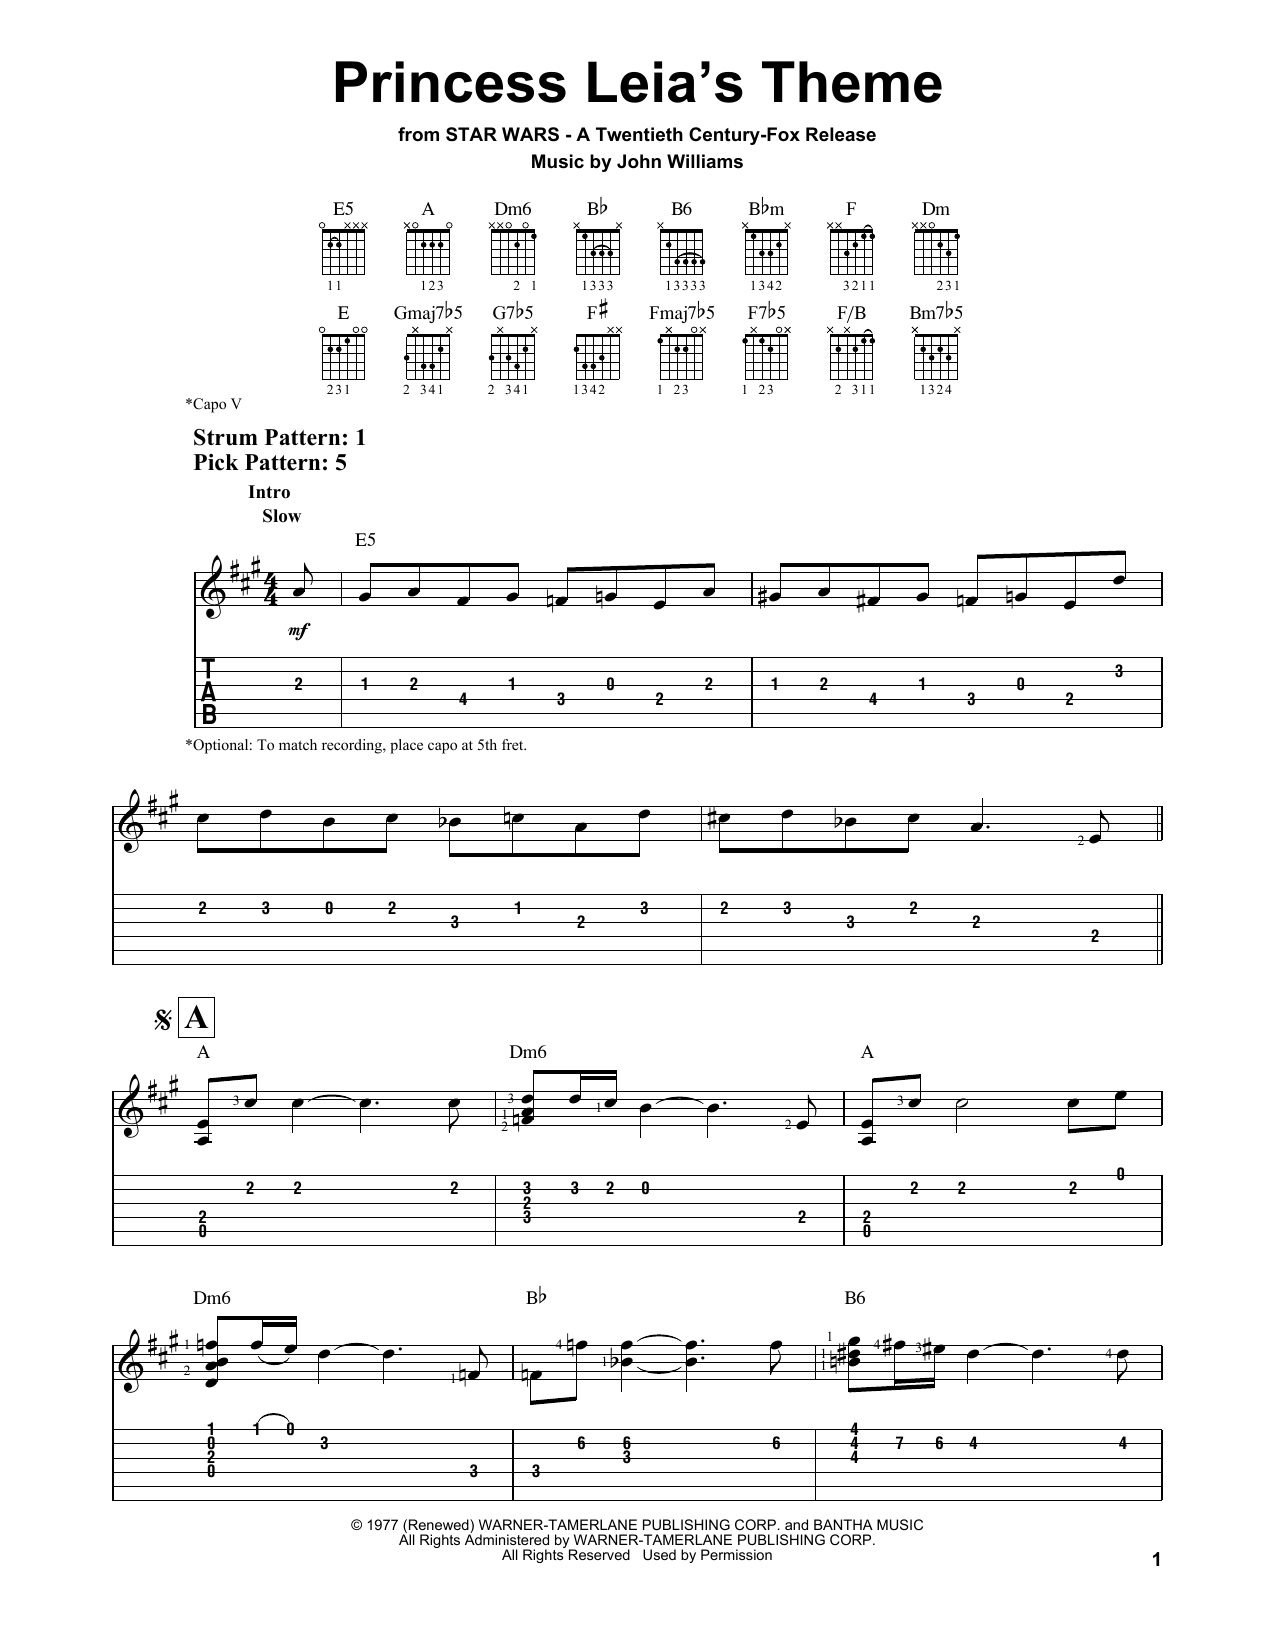 Princess Leia's Theme Sheet Music